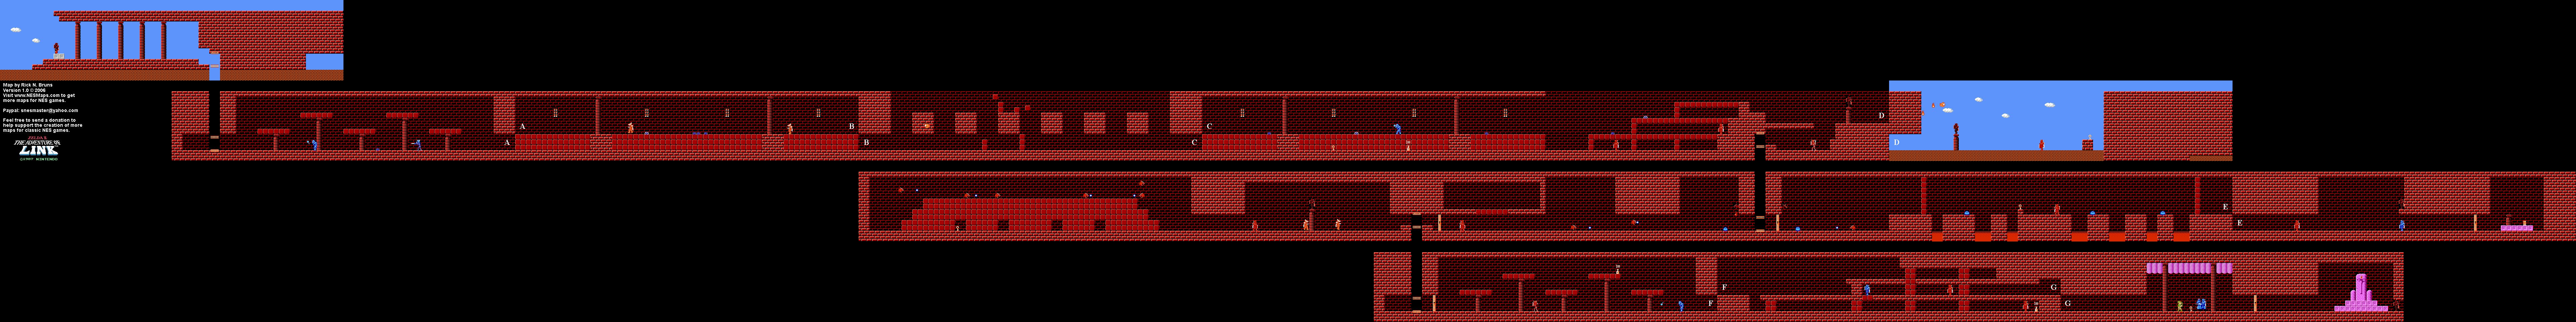 Zelda II - Island Palace (Level 3) Map [21]